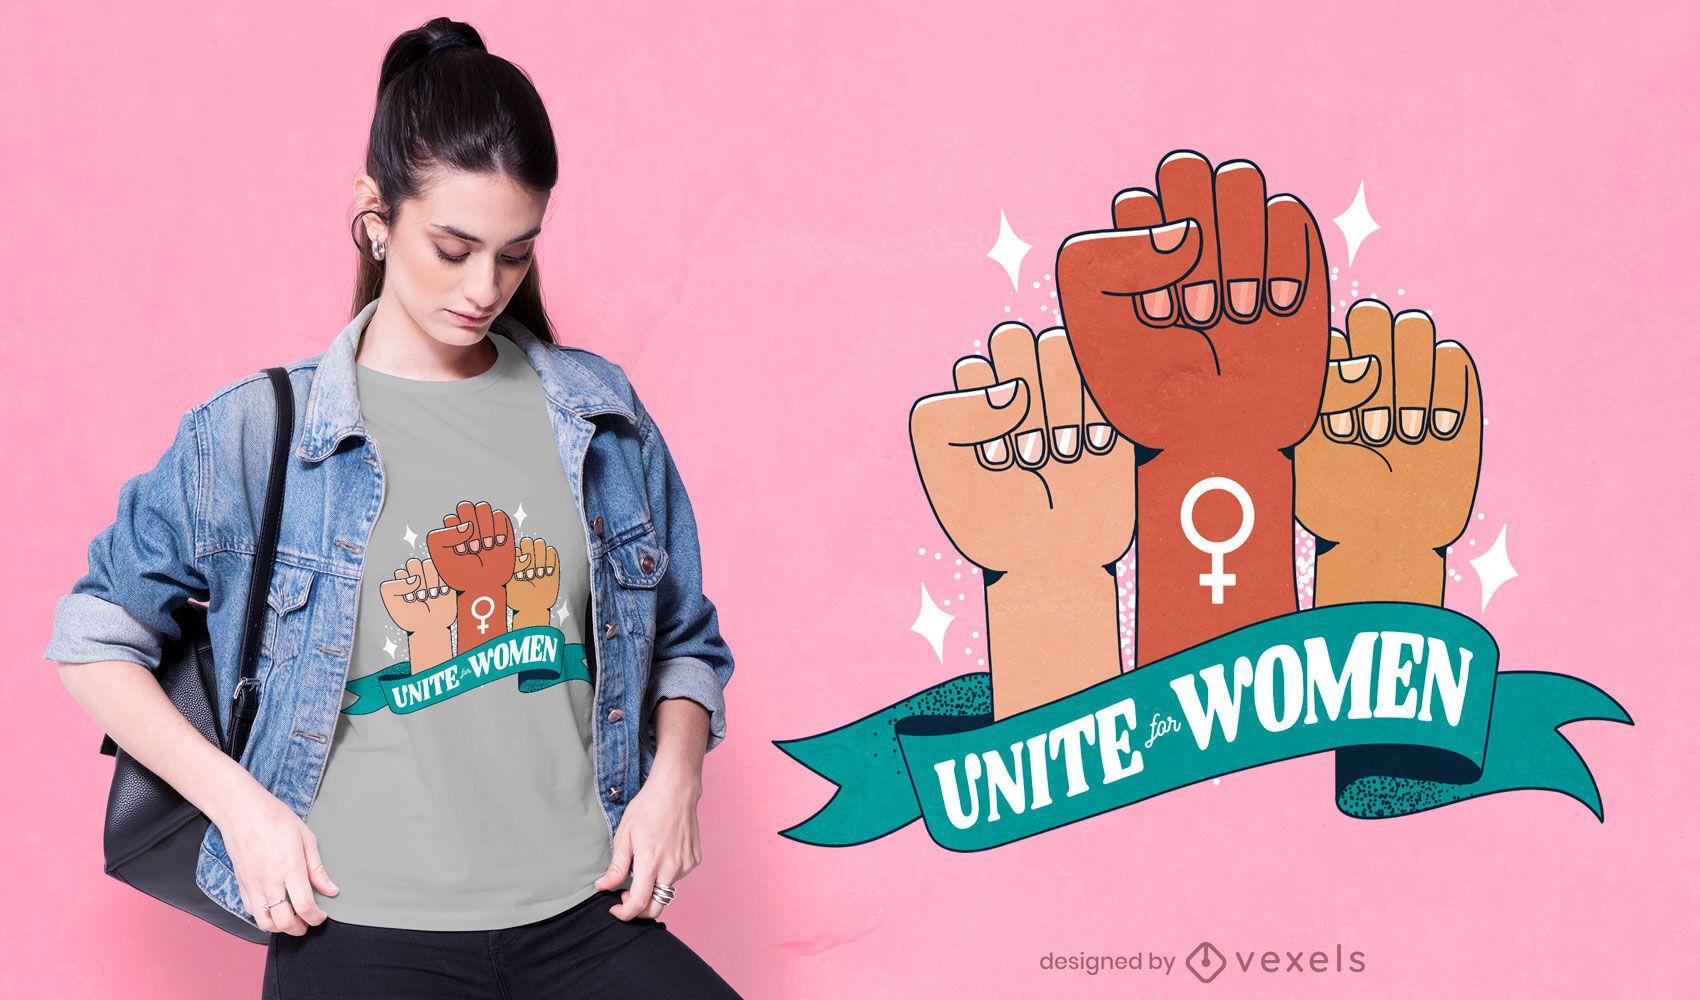 Unite women fists t-shirt design